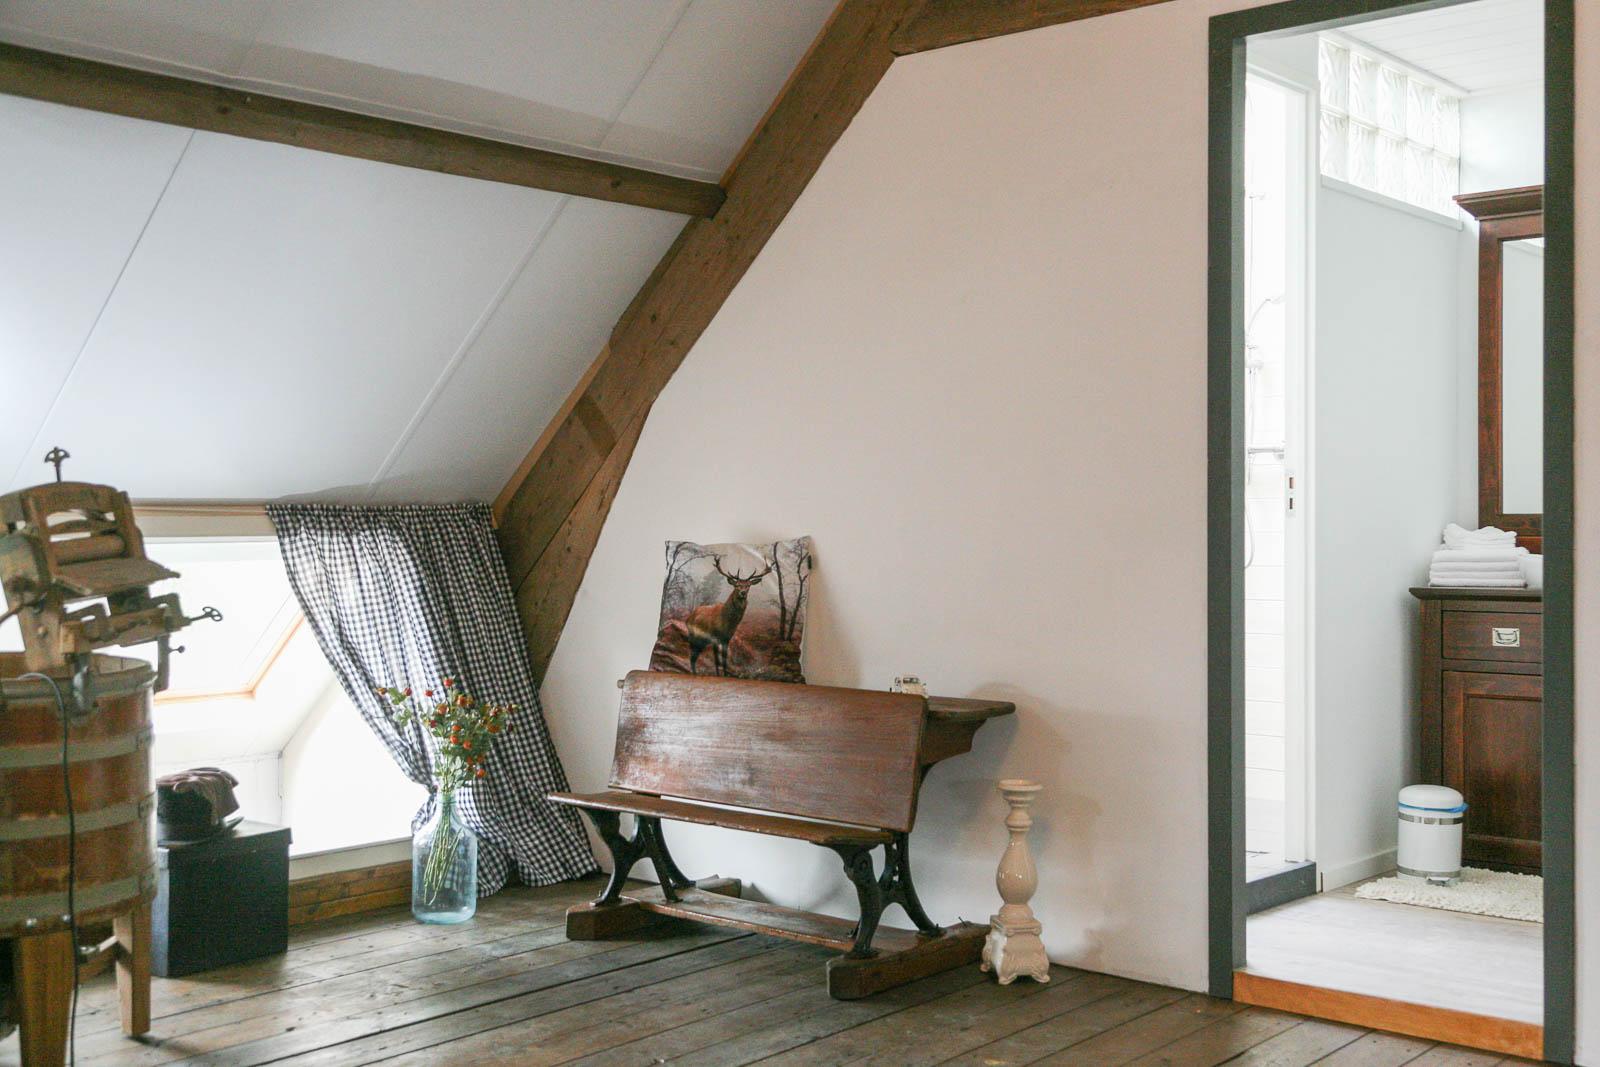 Hillegondahoeve-De Oude Stal-1451